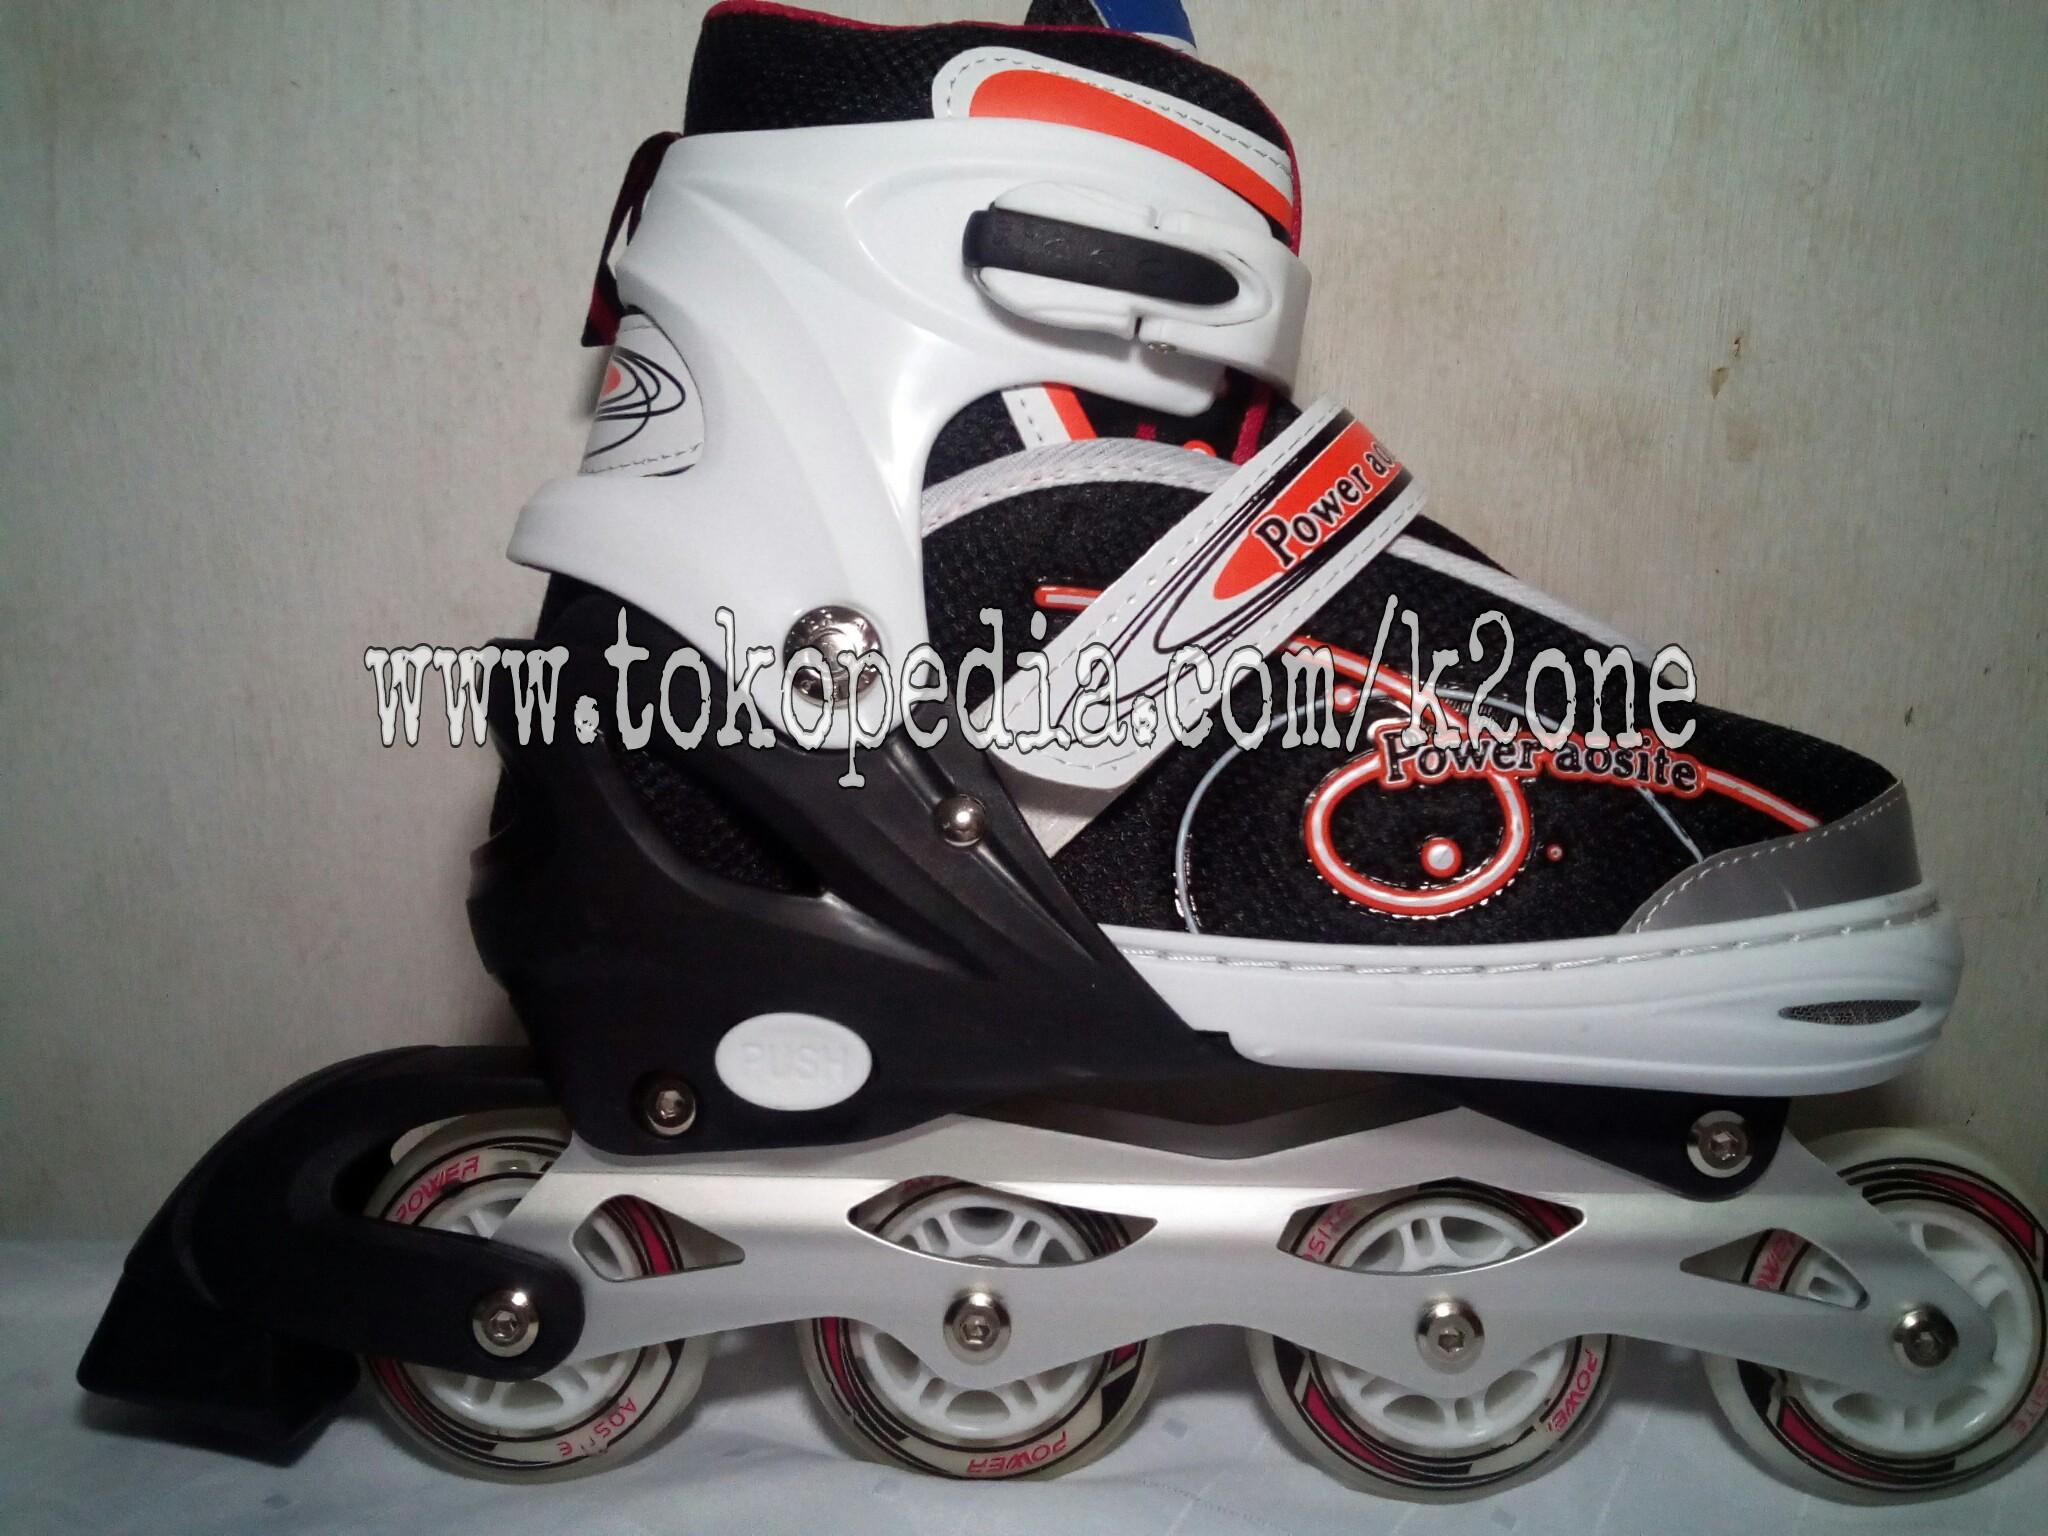 f6ca3a56aa jpg Source · Jual Sepatu Roda Inline Skate Anak Power Aosite ban  Karet K2ONE Tokopedia 2b8fa0be0f